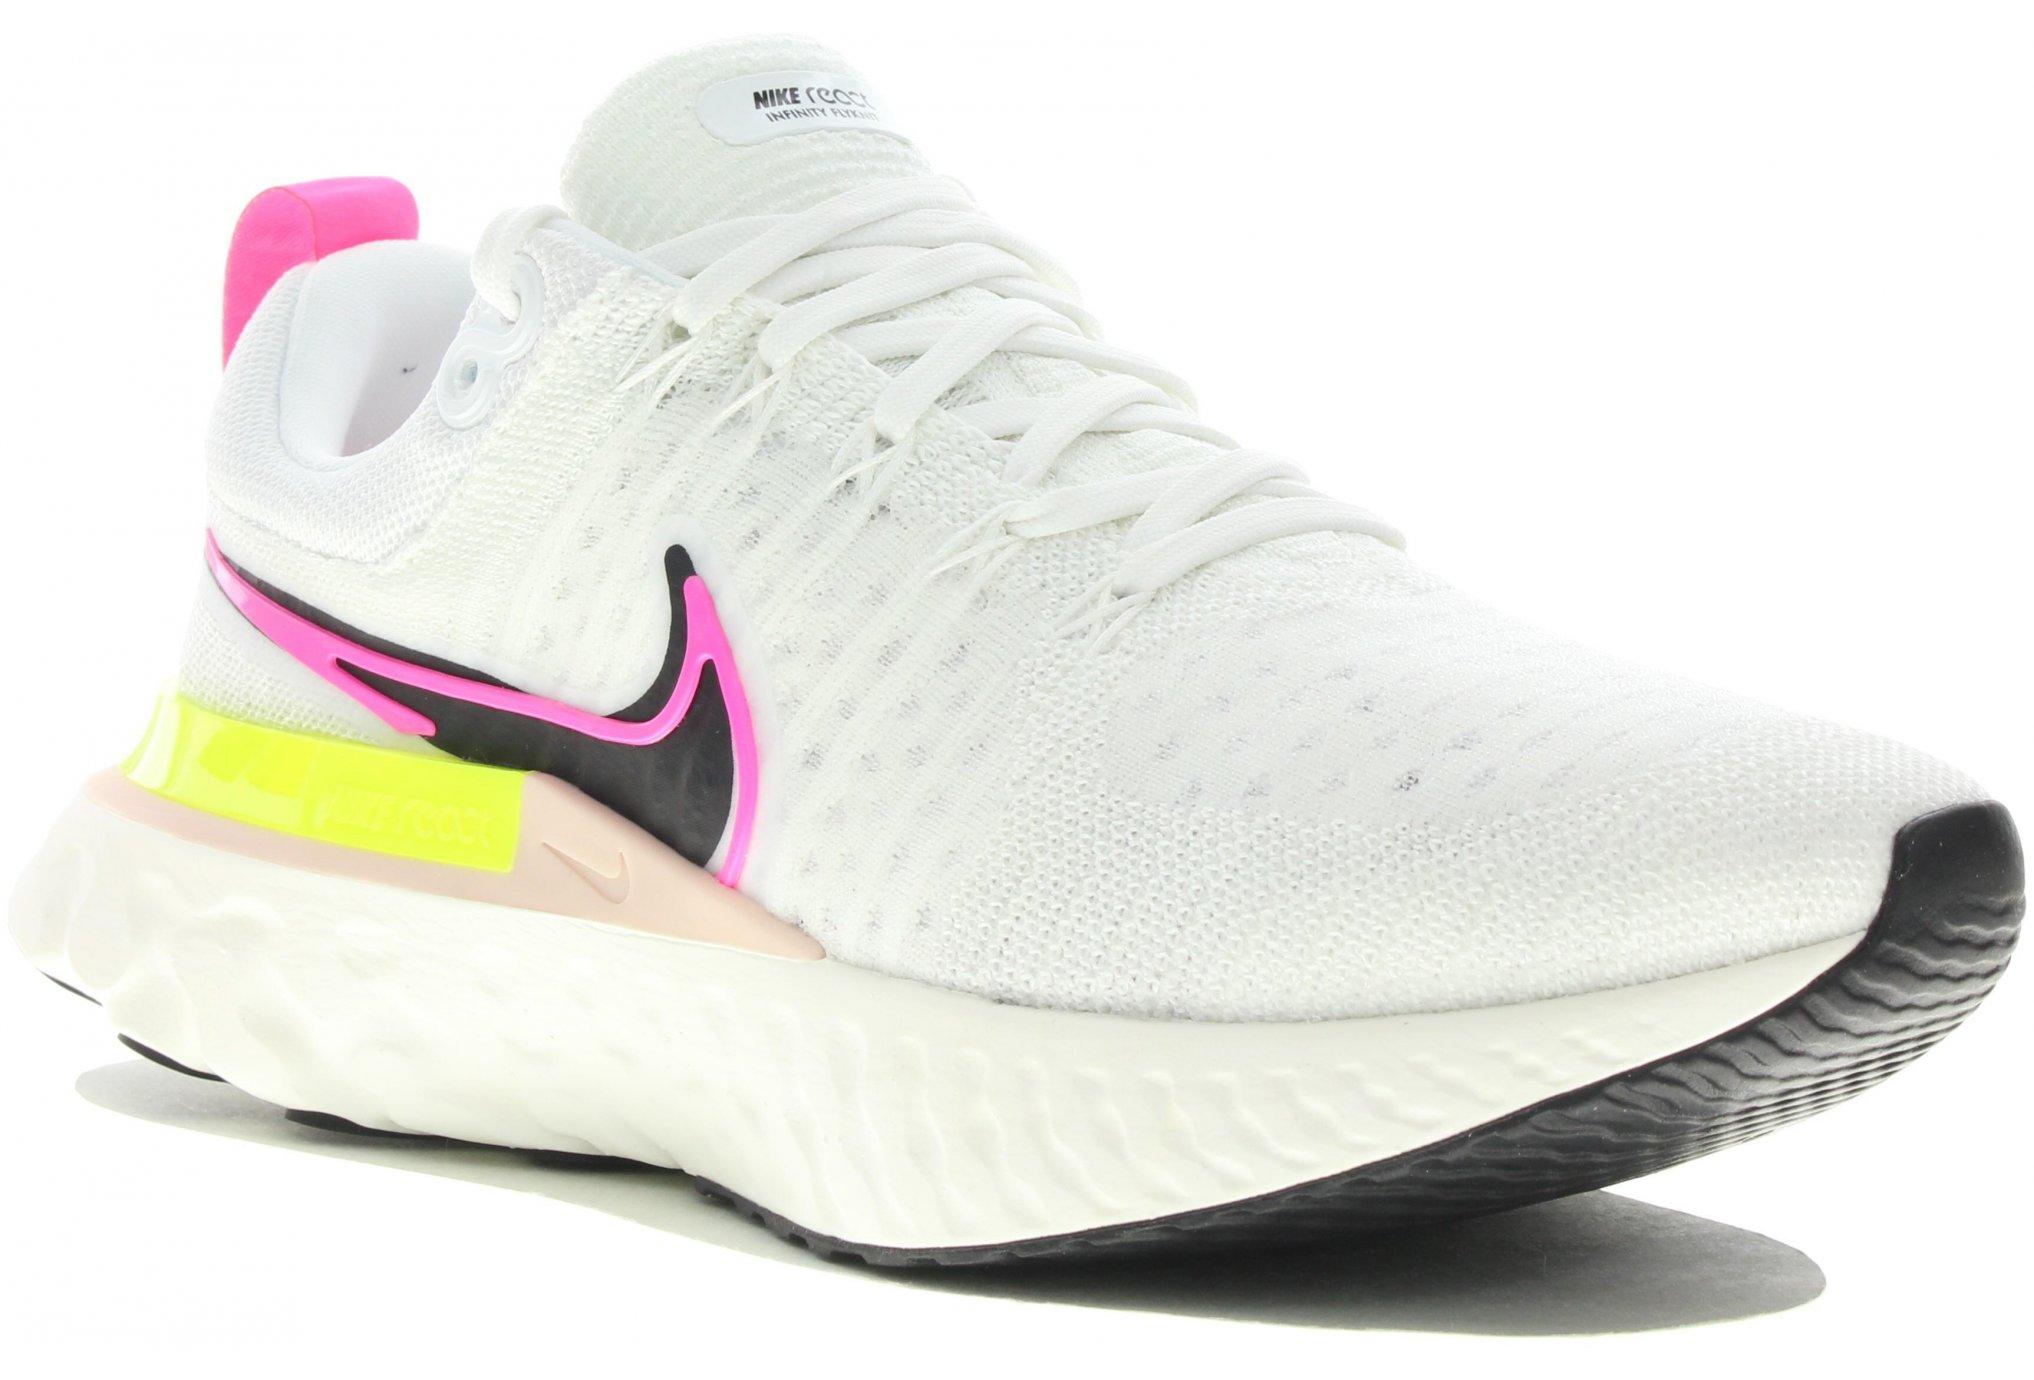 Nike React Infinity Run Flyknit 2 Rawdacious W Chaussures running femme